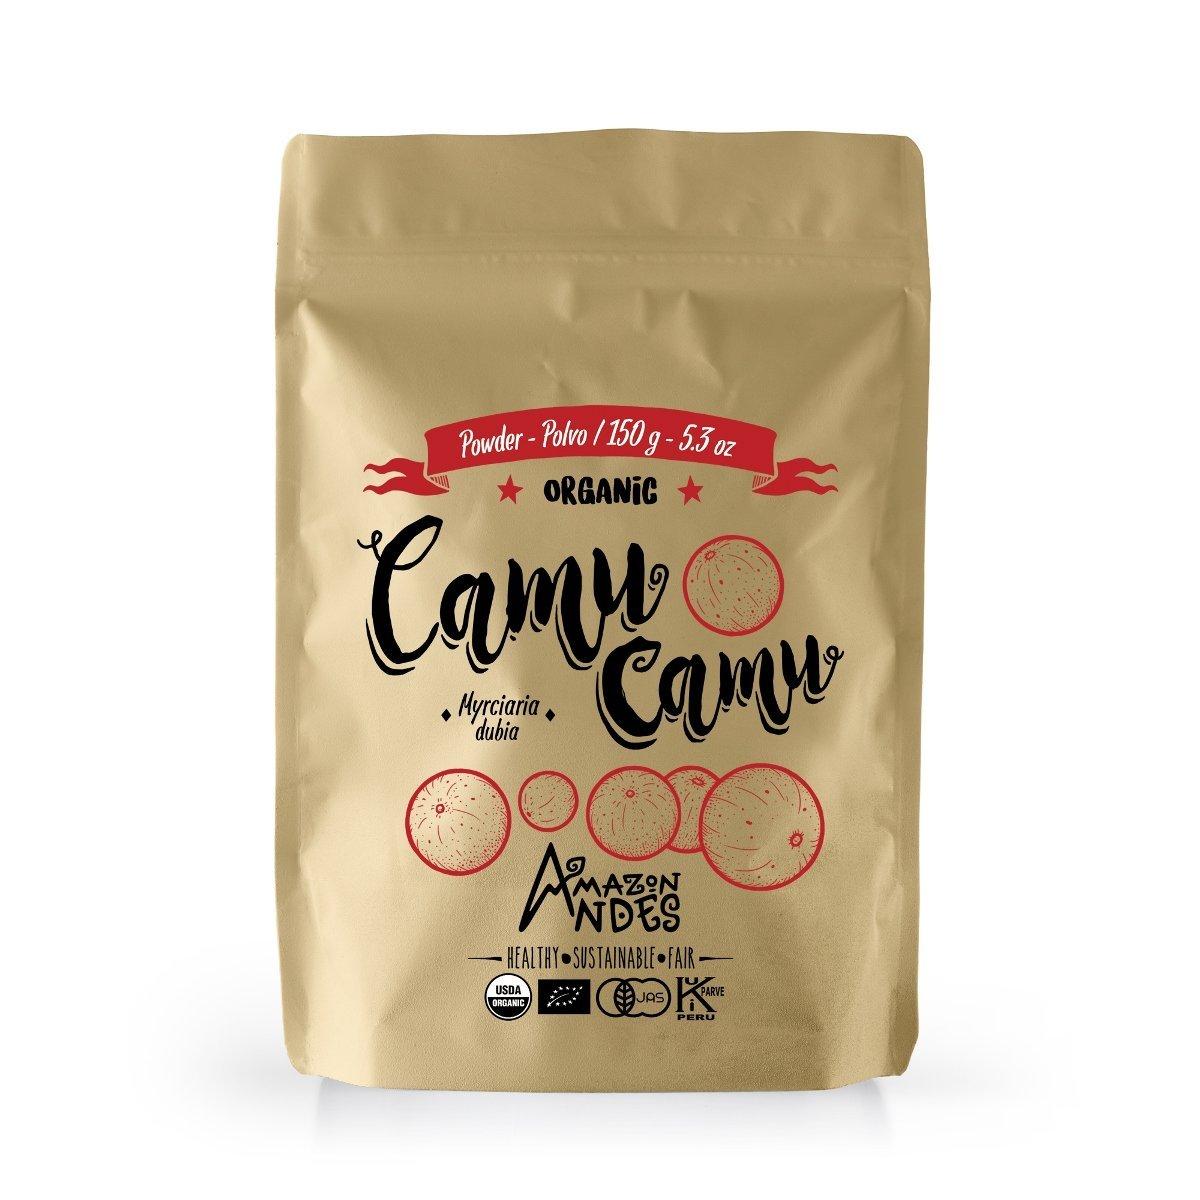 Camu camu powder dosage